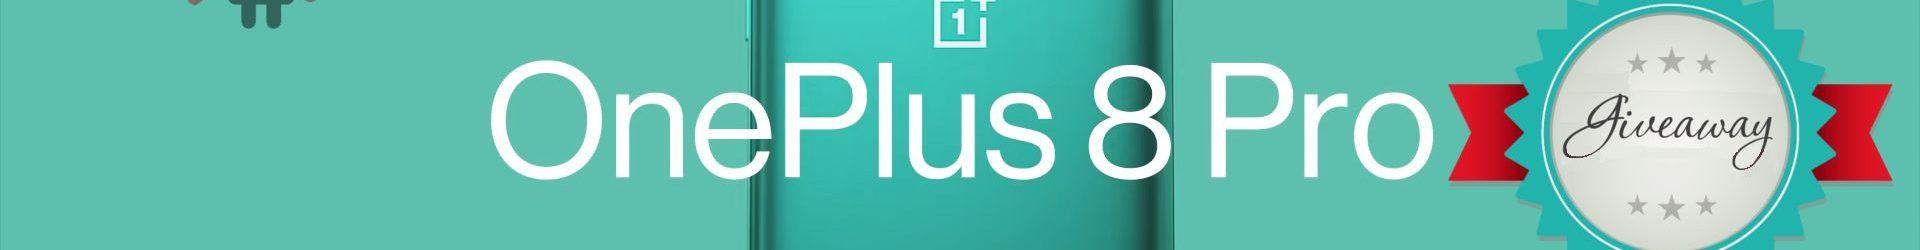 OnePlus 8 Pro: prova a vincerne uno partecipando a questo giveaway